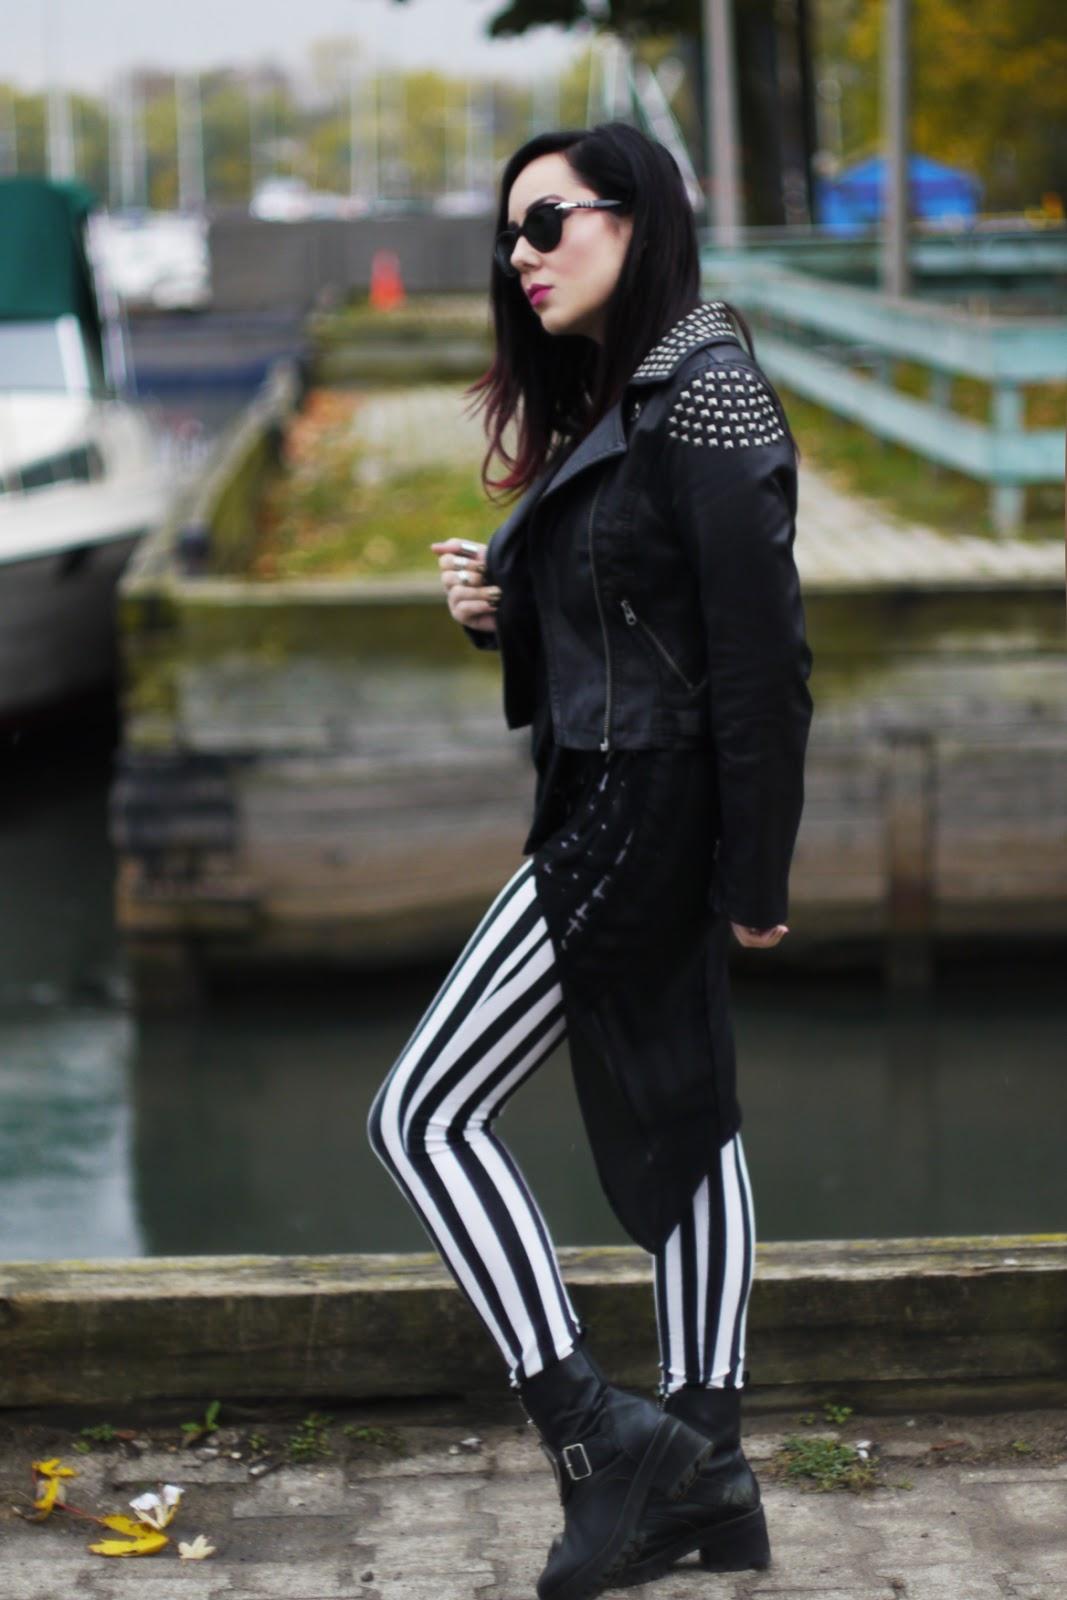 OOTD: Stripes, Leather and Crosses - Tara Mason